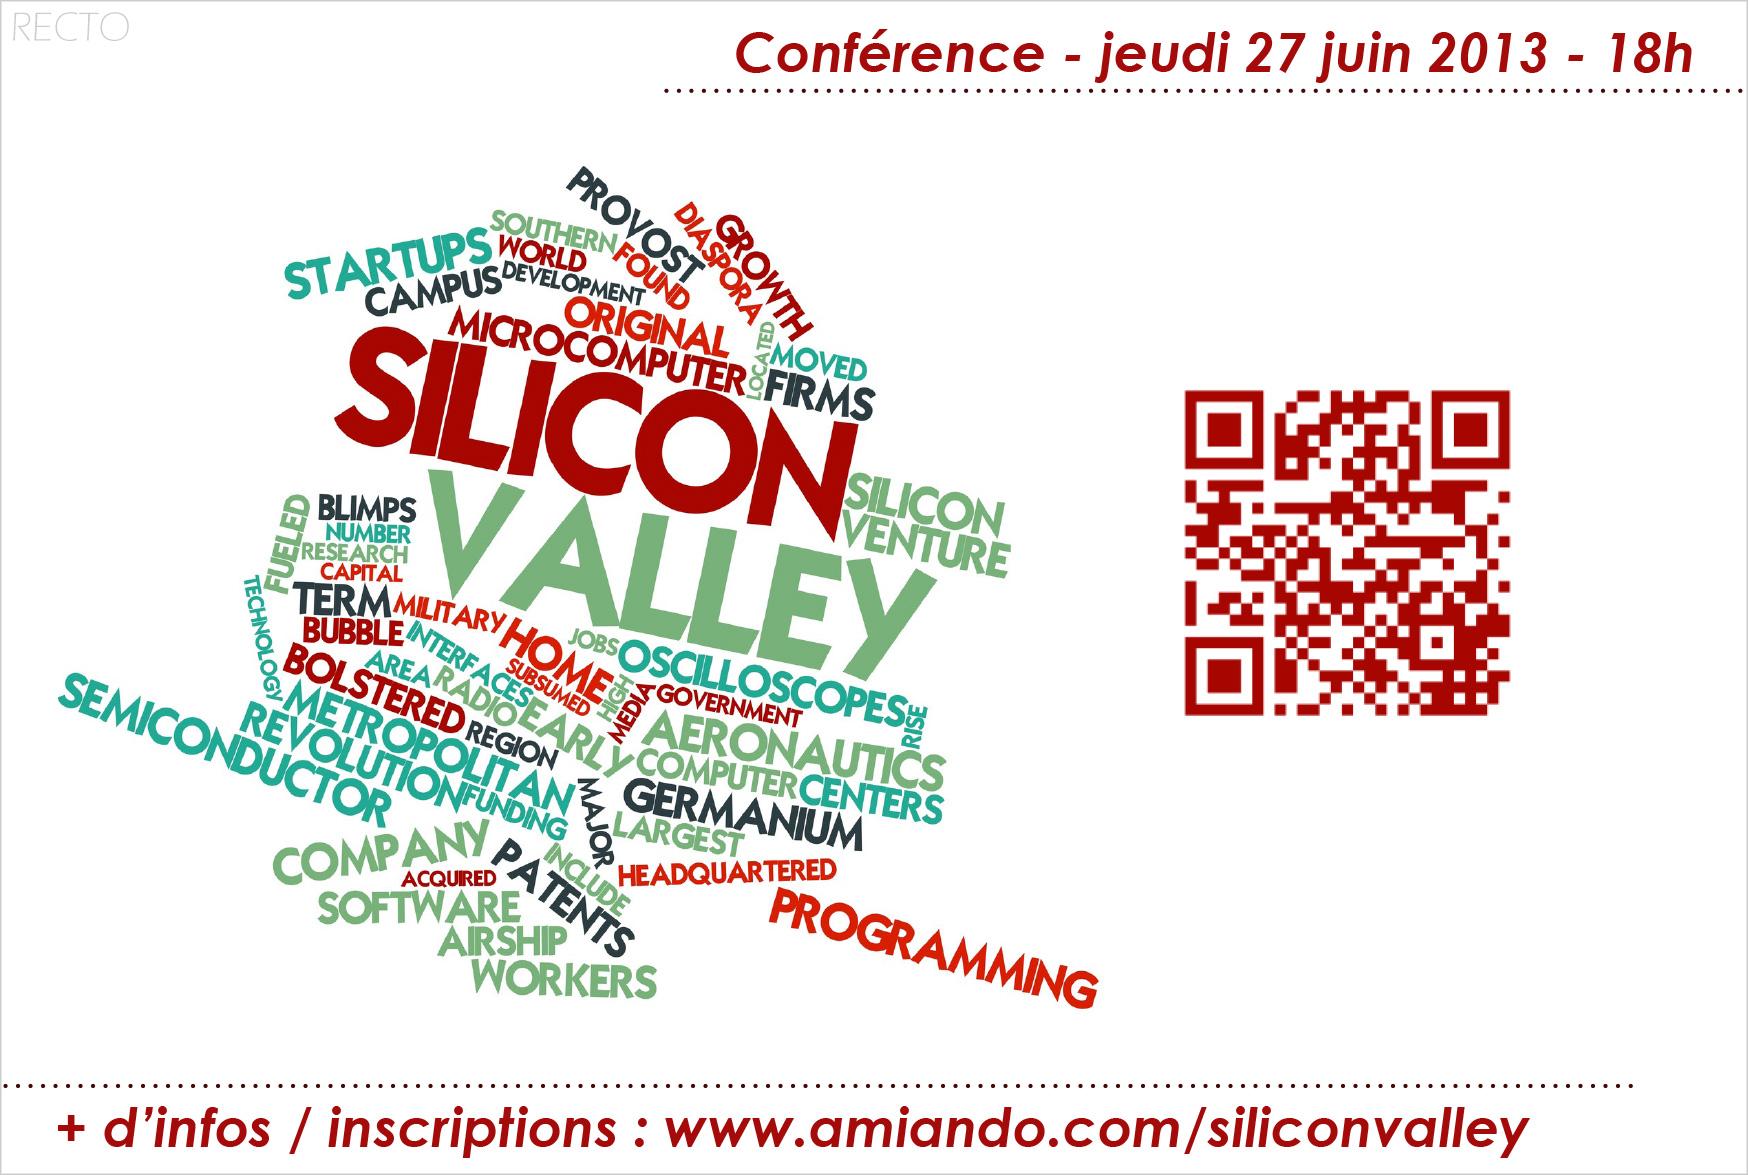 flyer-silicon-valley-recto